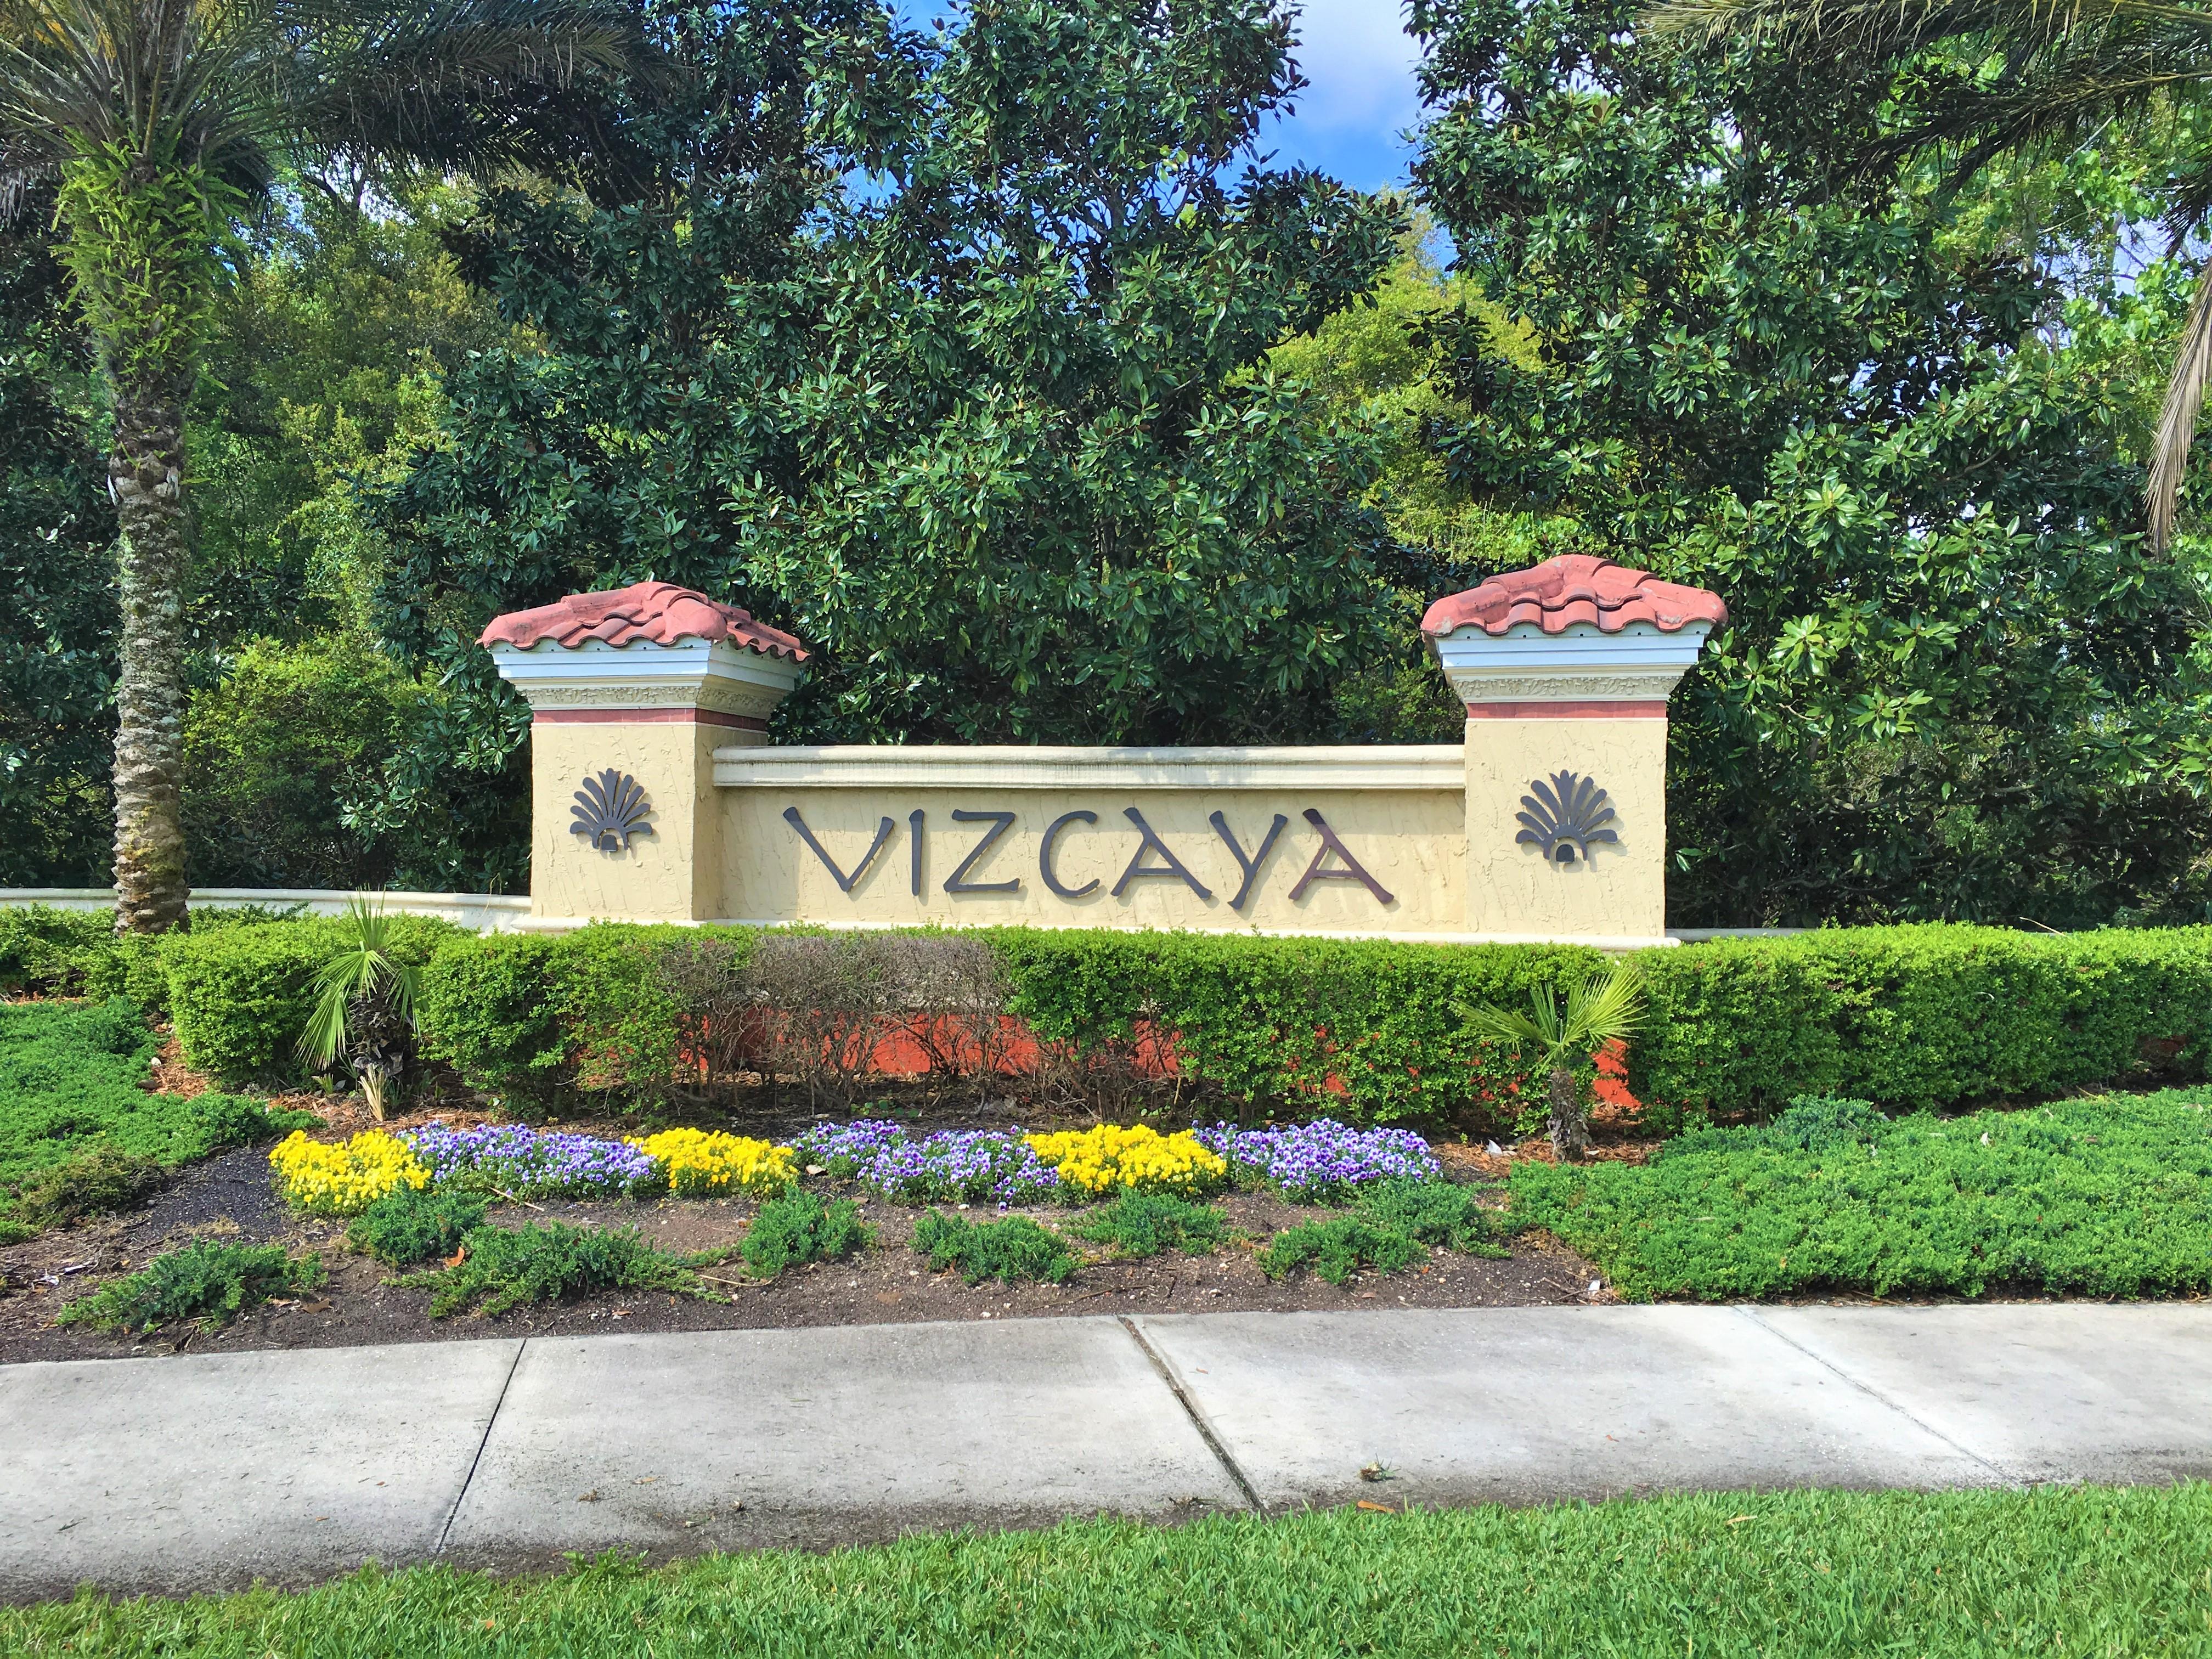 Wondrous Vizcaya Townhomes For Sale Jacksonville Fl Interior Design Ideas Gentotryabchikinfo